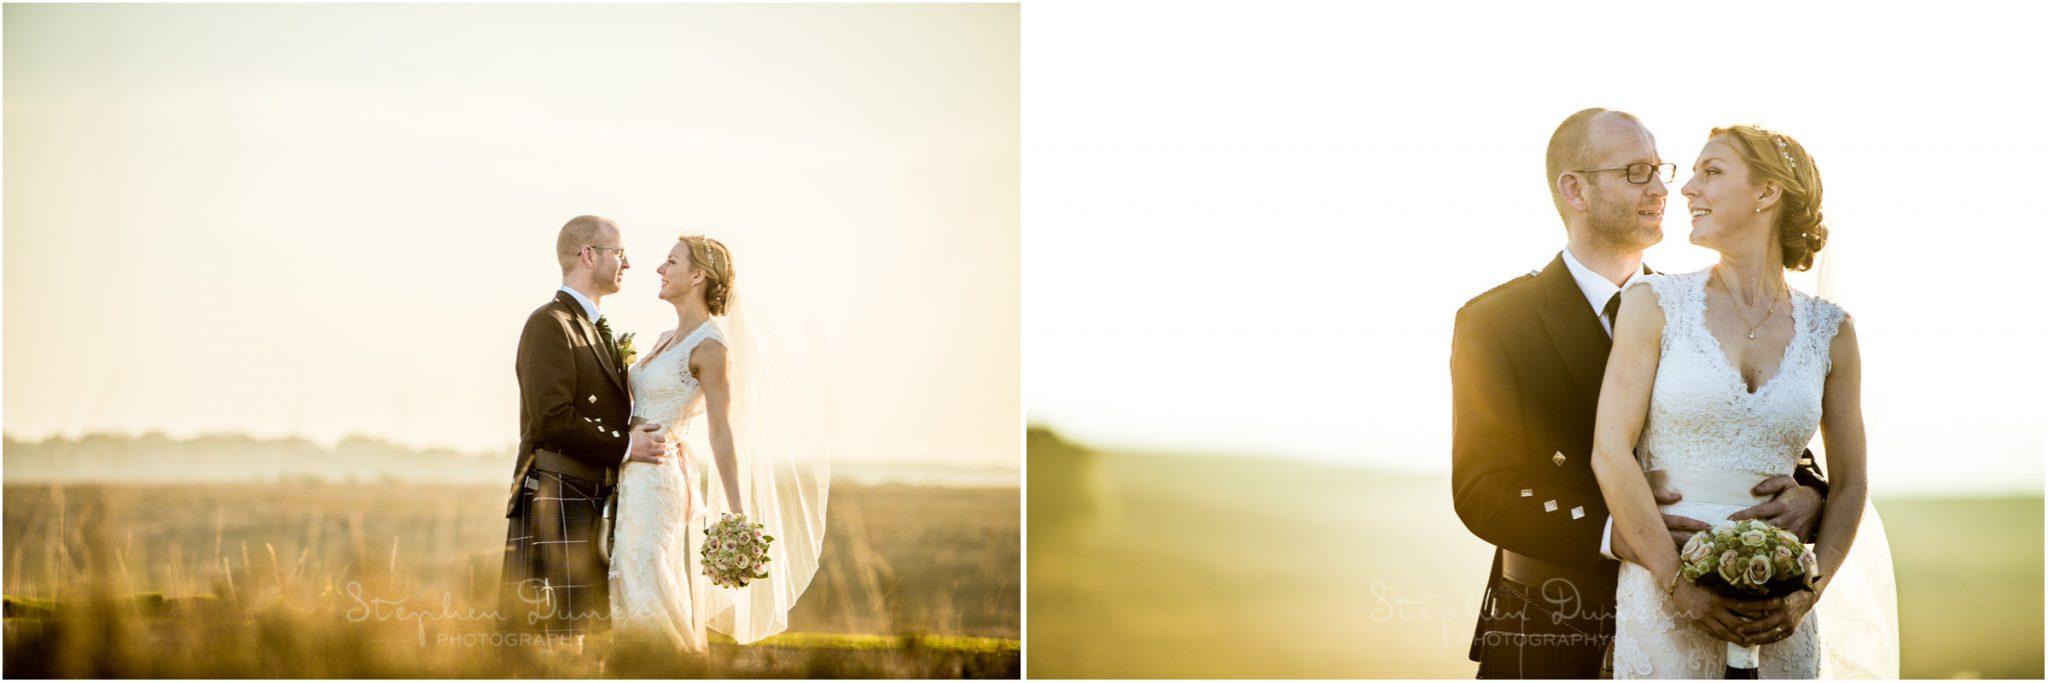 Romsey Abbey wedding photographer couple portraits in winter light